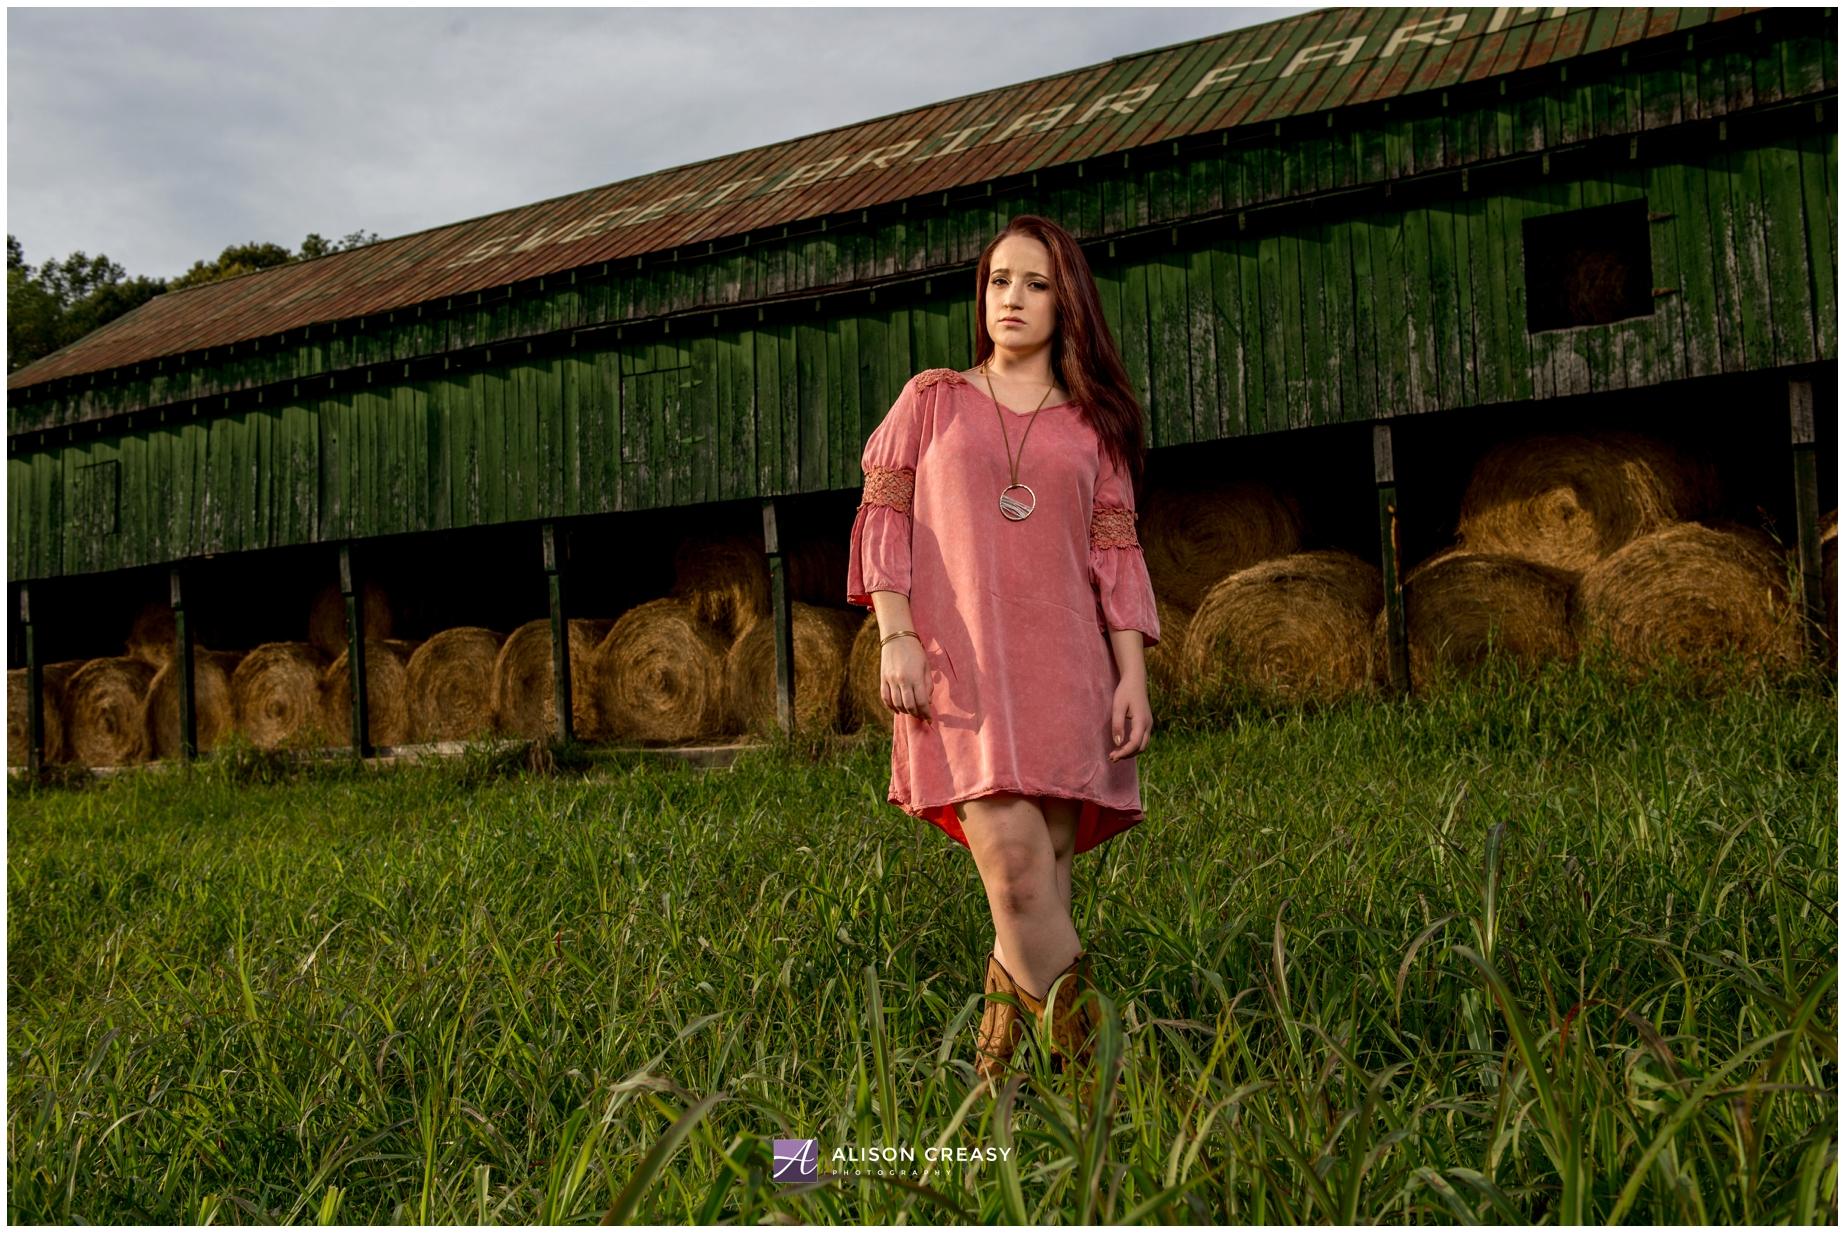 Alison-Creasy-Photography-Lynchburg-VA-Photographer_0955.jpg